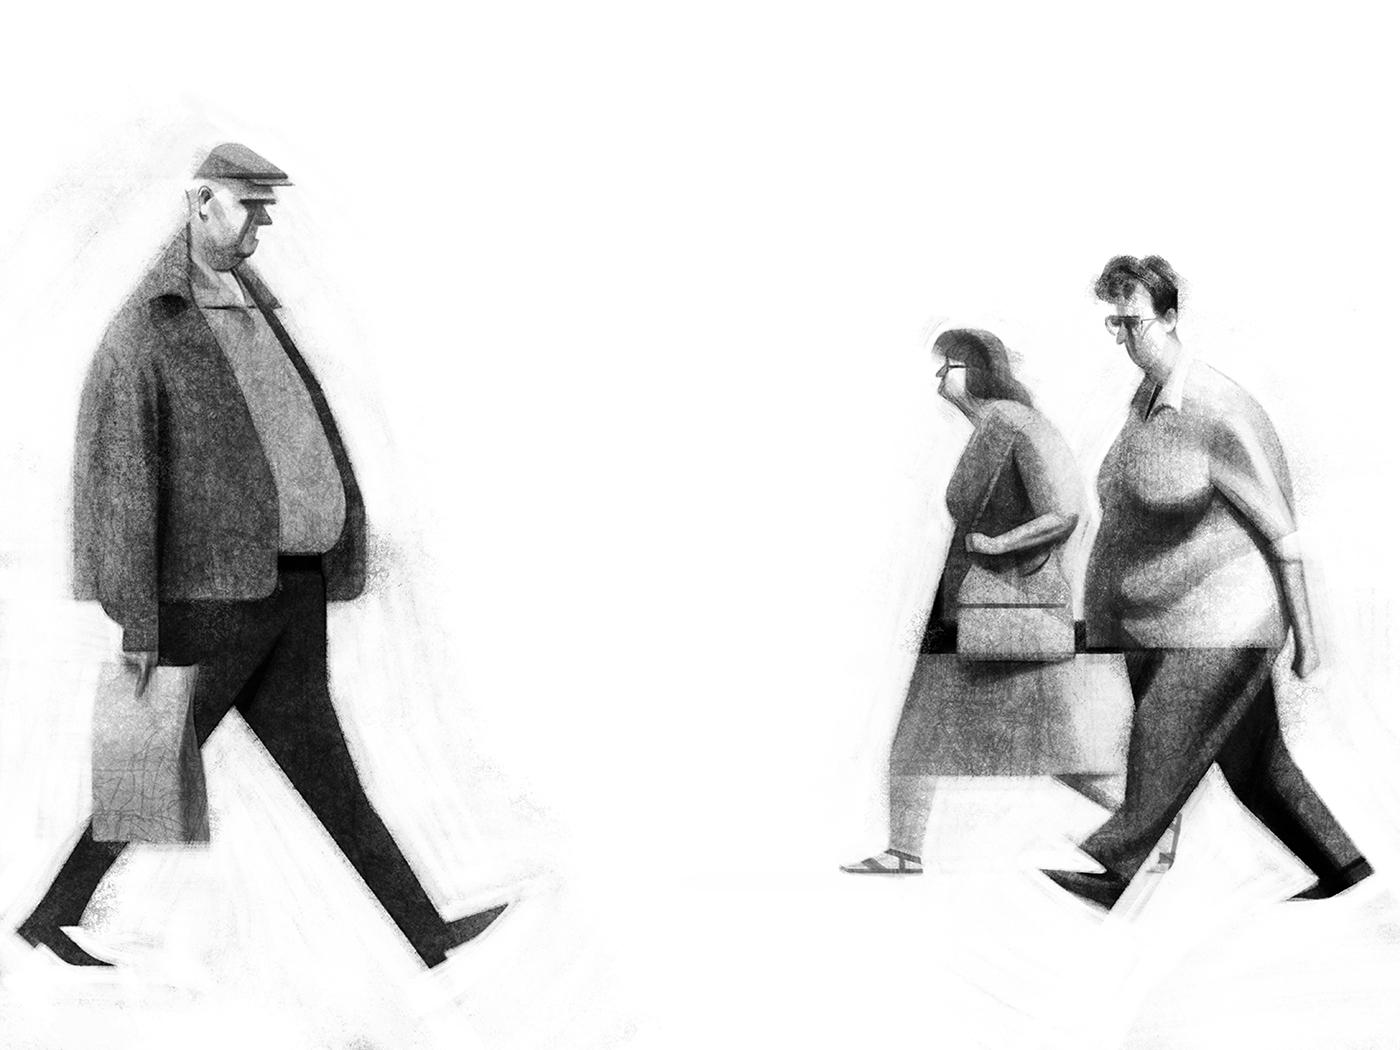 walking illustration drawing behance photoshop character render forward words